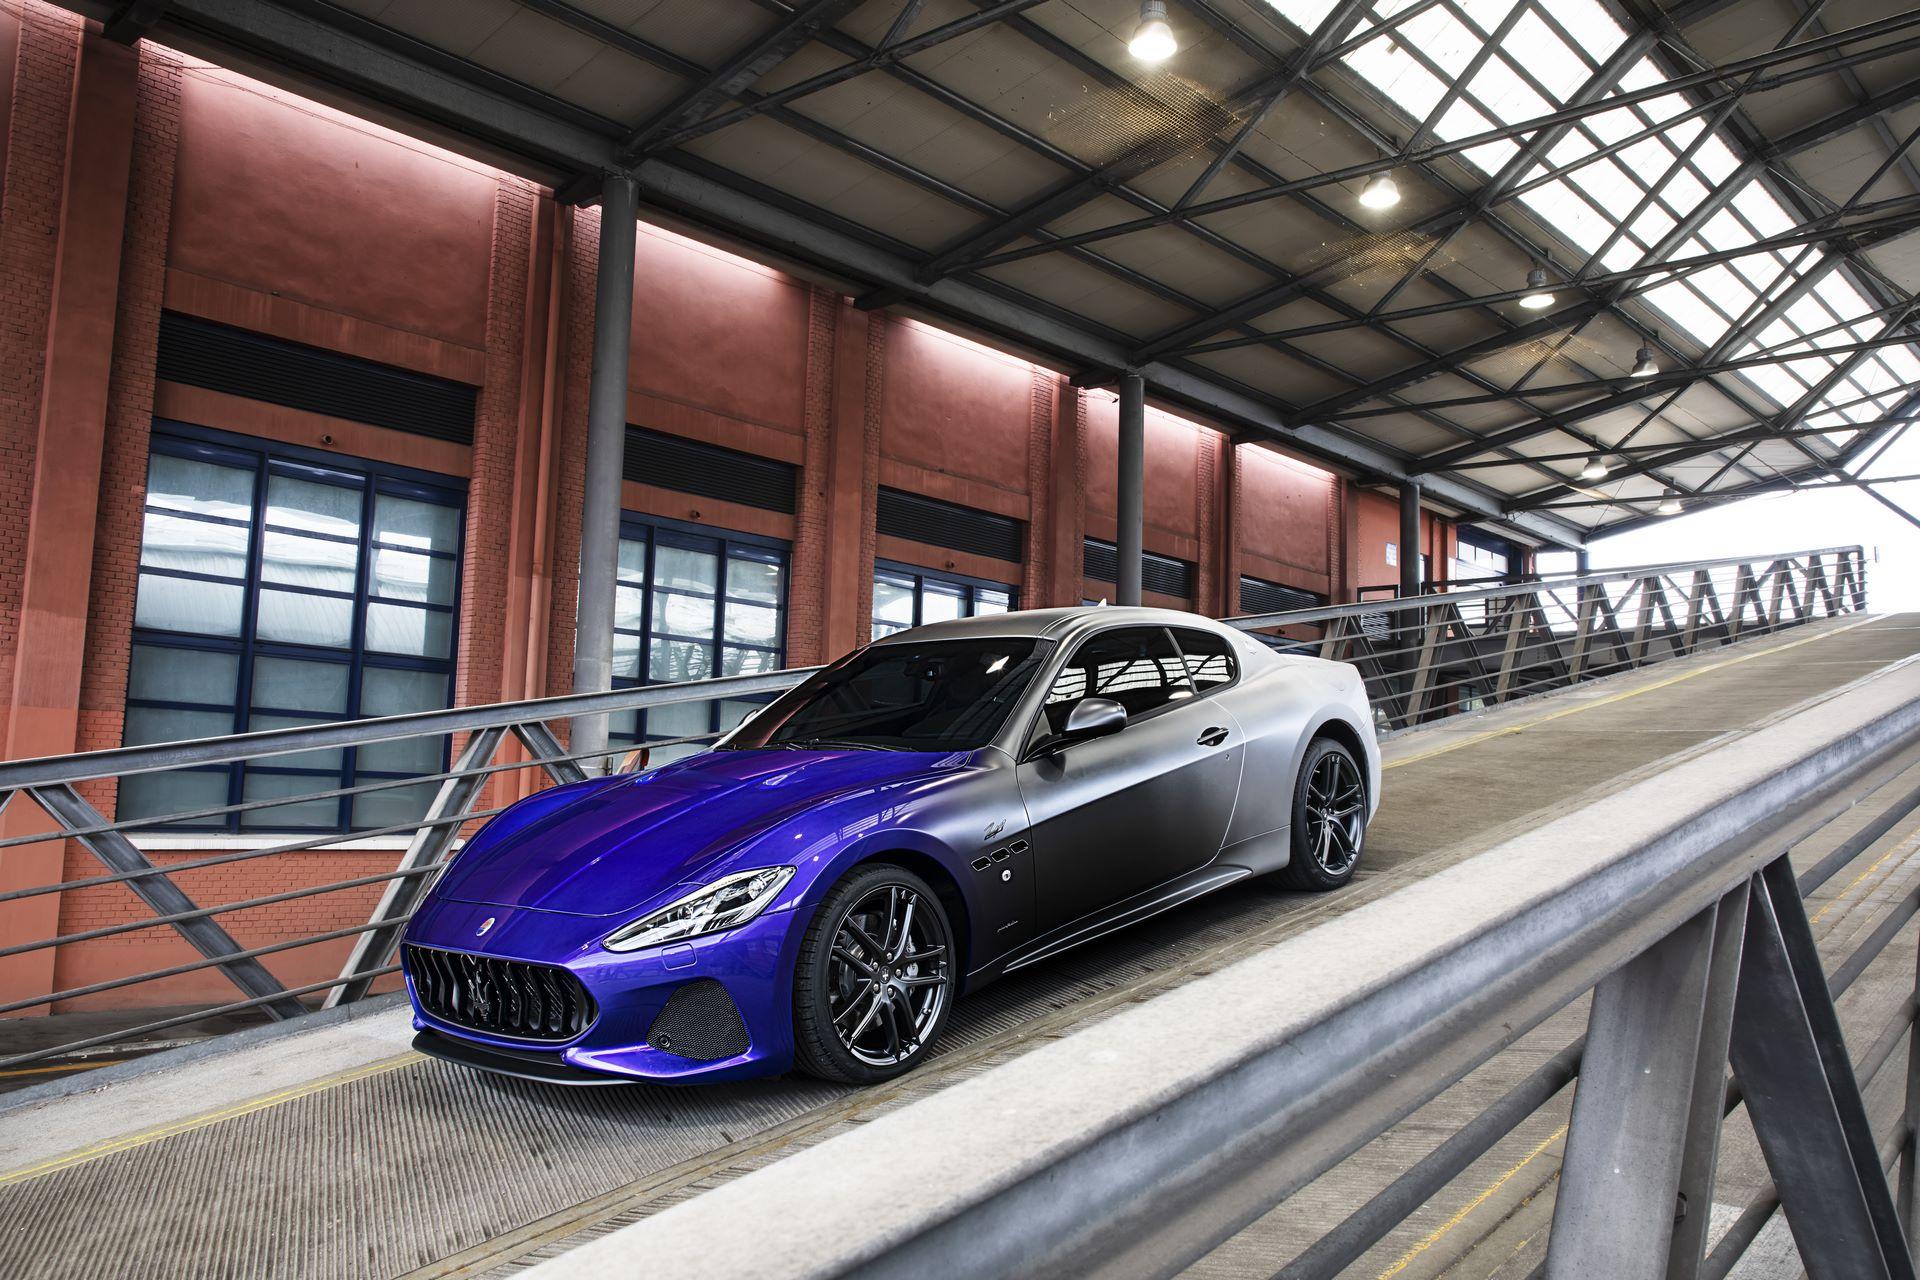 Maserati-GranTurismo-Zeda-1